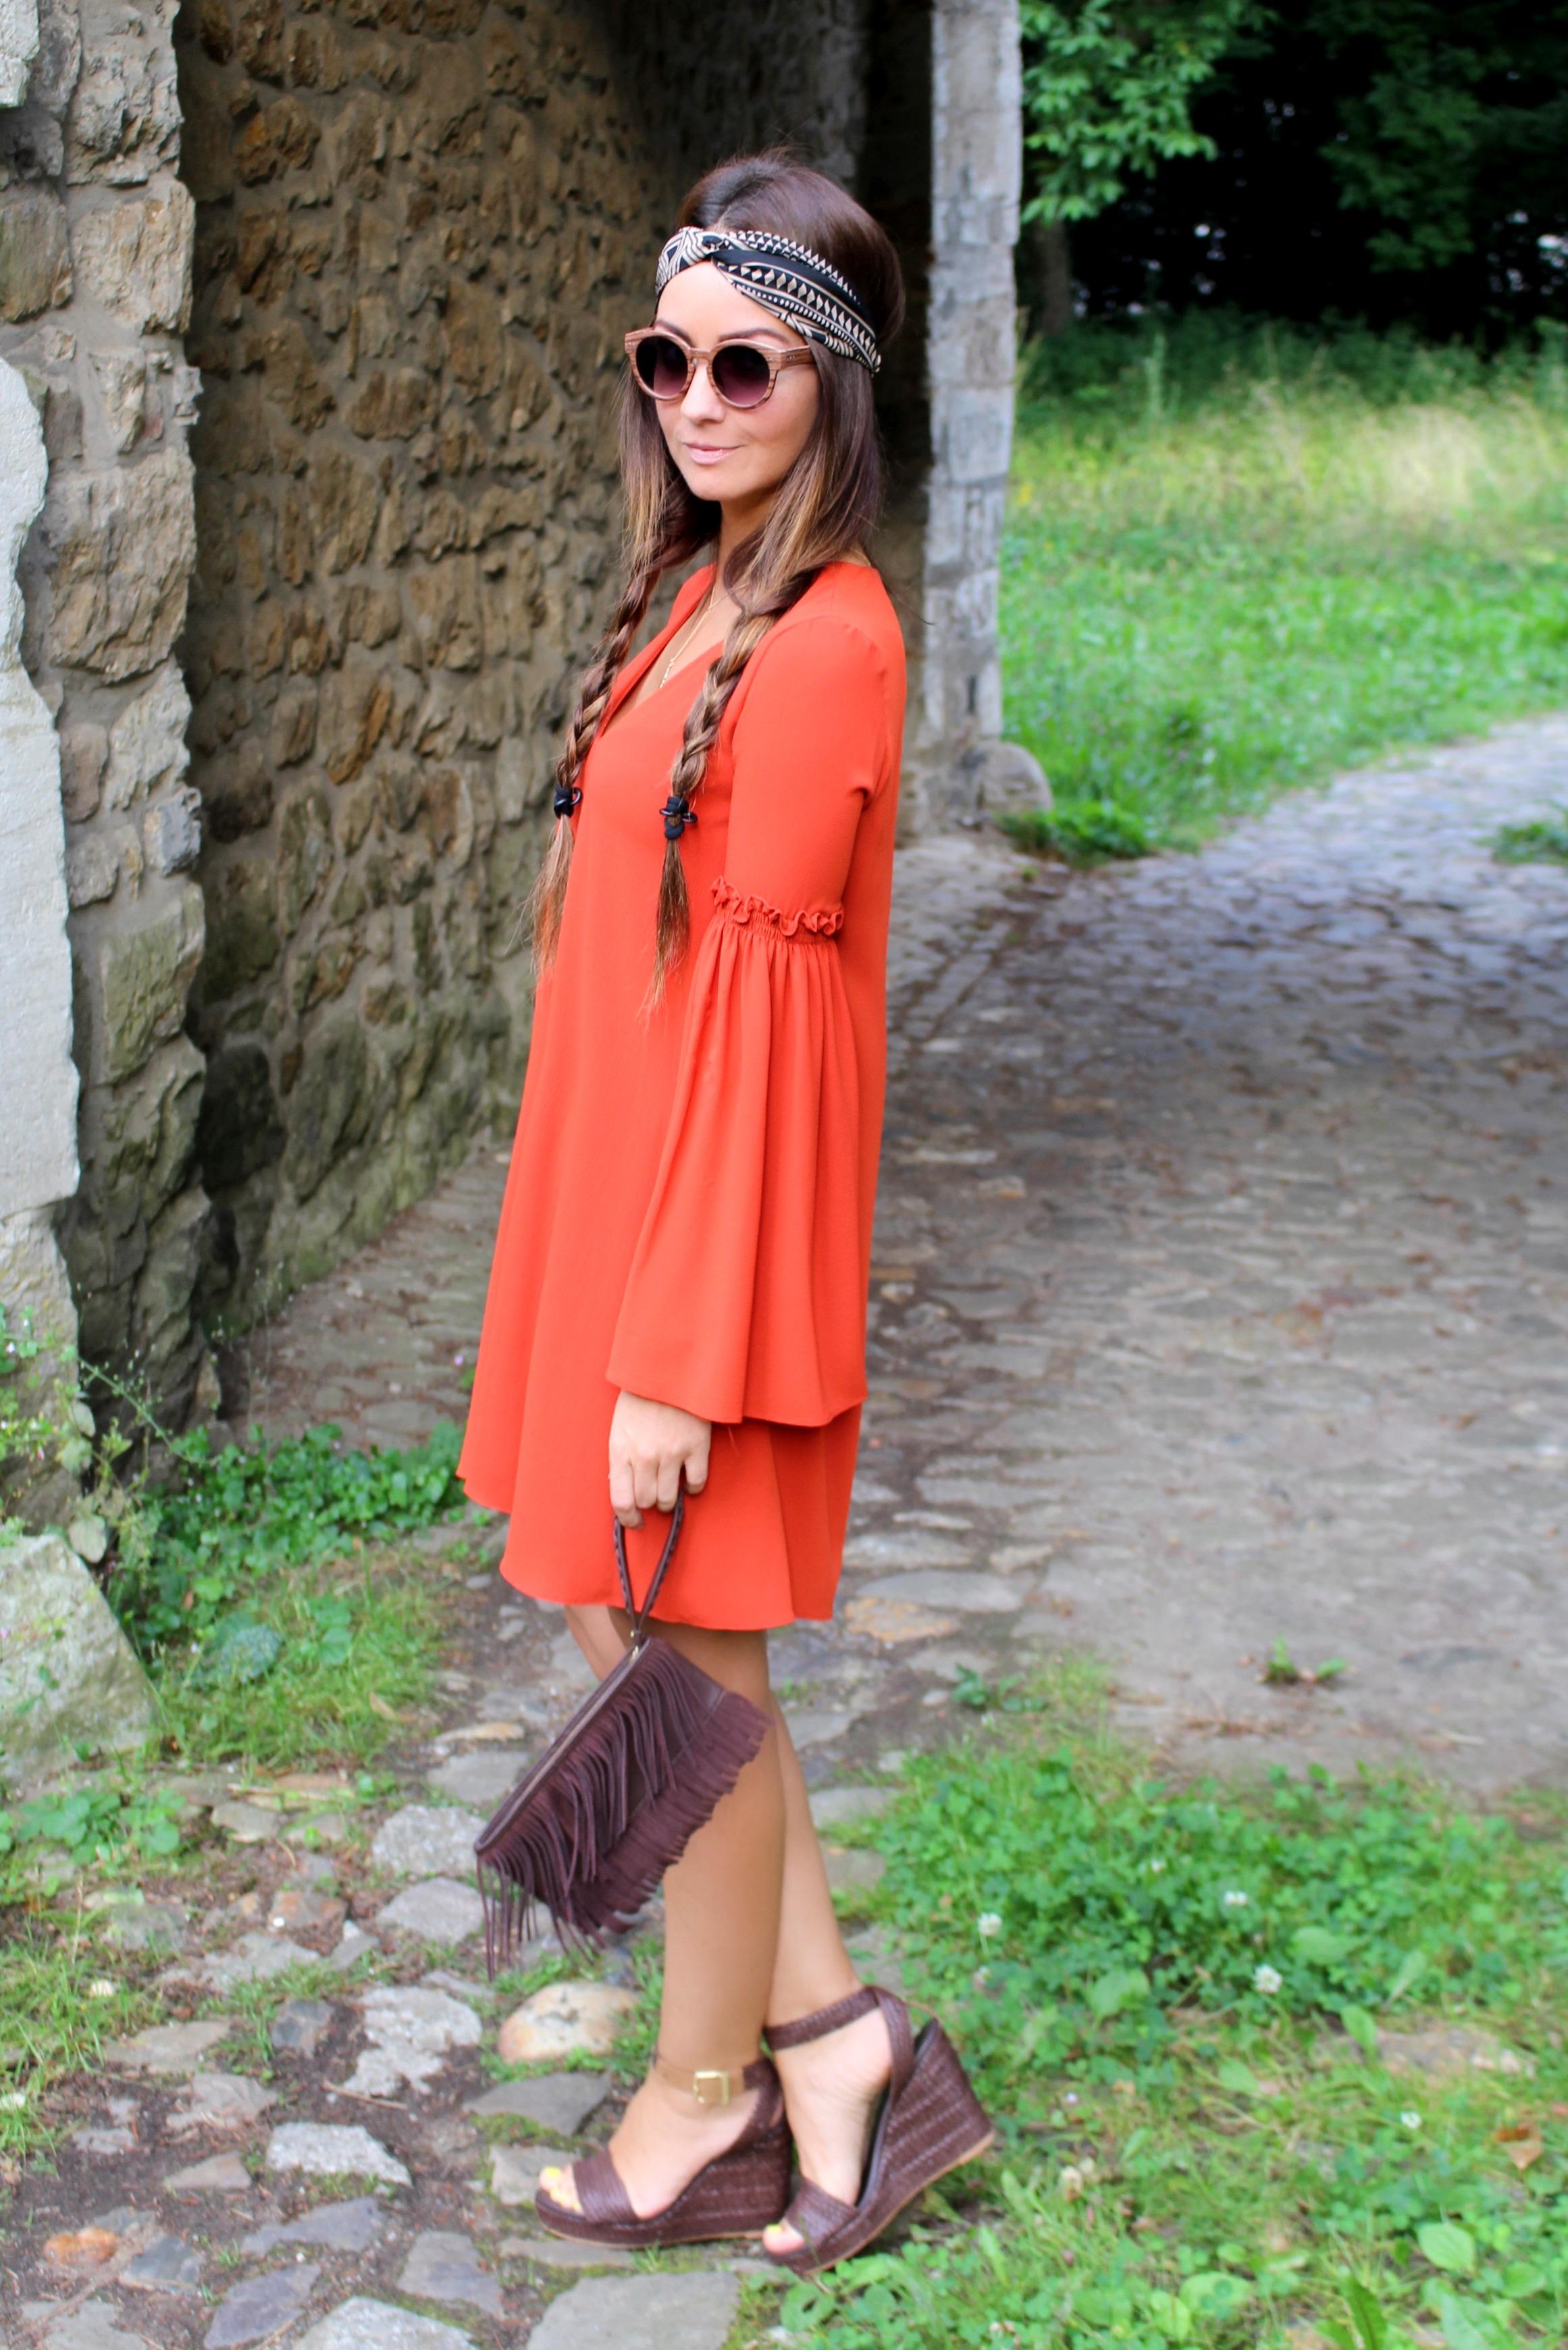 Fashioncircuz by Jenny img_0398a HIPPIEGIRL IN RED